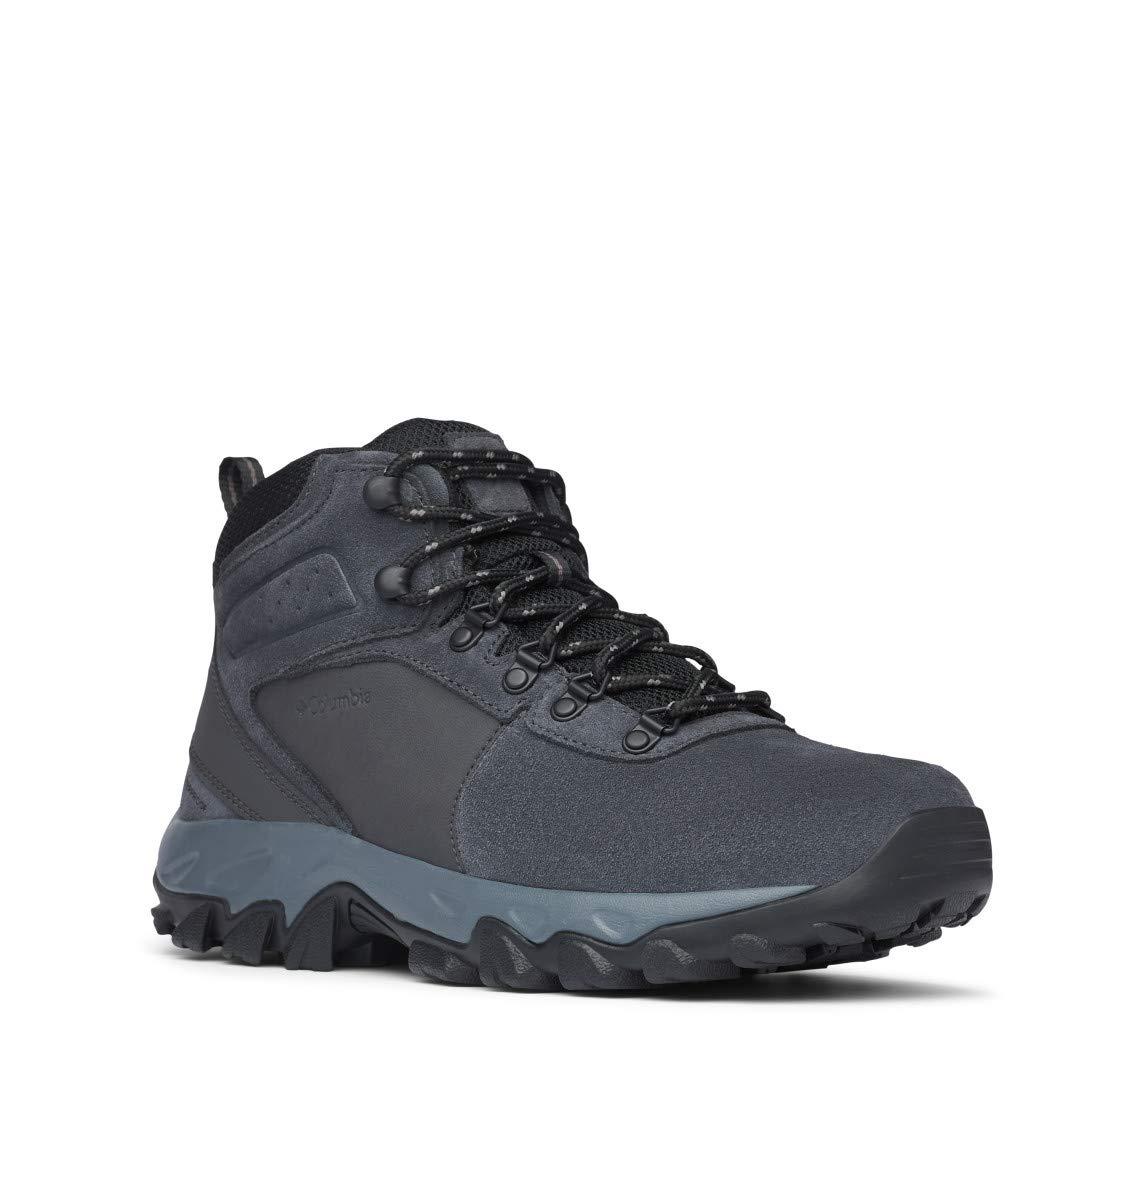 Columbia Men's Newton Ridge Plus II Suede Waterproof Boot, Breathable with High-Traction Grip Hiking, Shark, Black, 7.5 Regular US